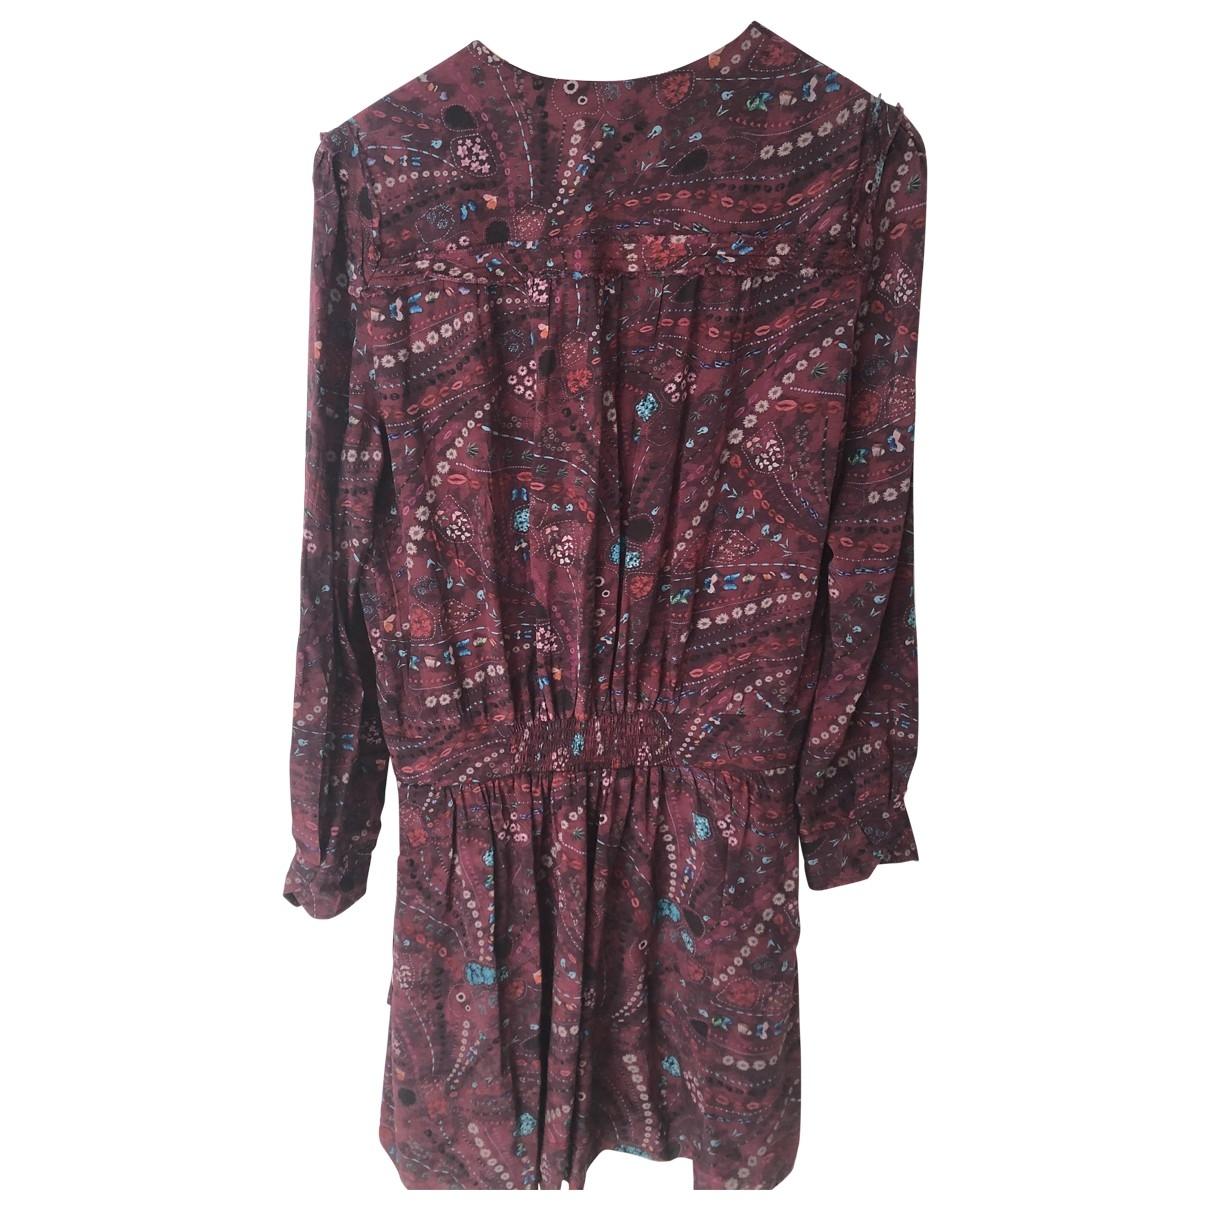 Zadig & Voltaire \N Kleid in  Bunt Baumwolle